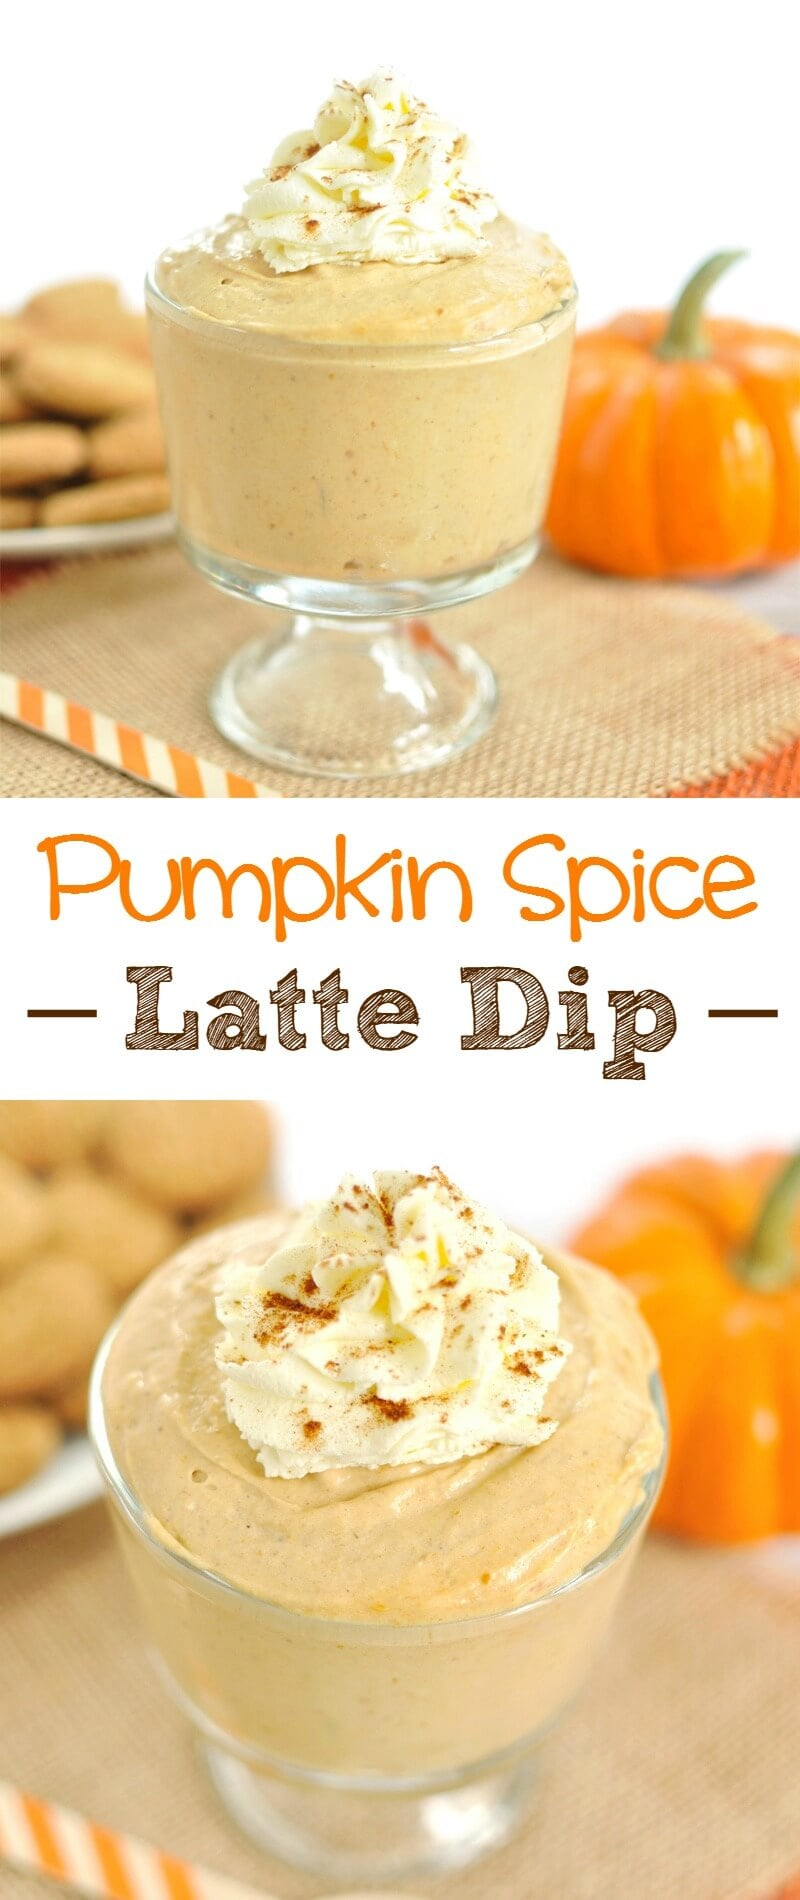 Pumpkin Spice Latte Dip